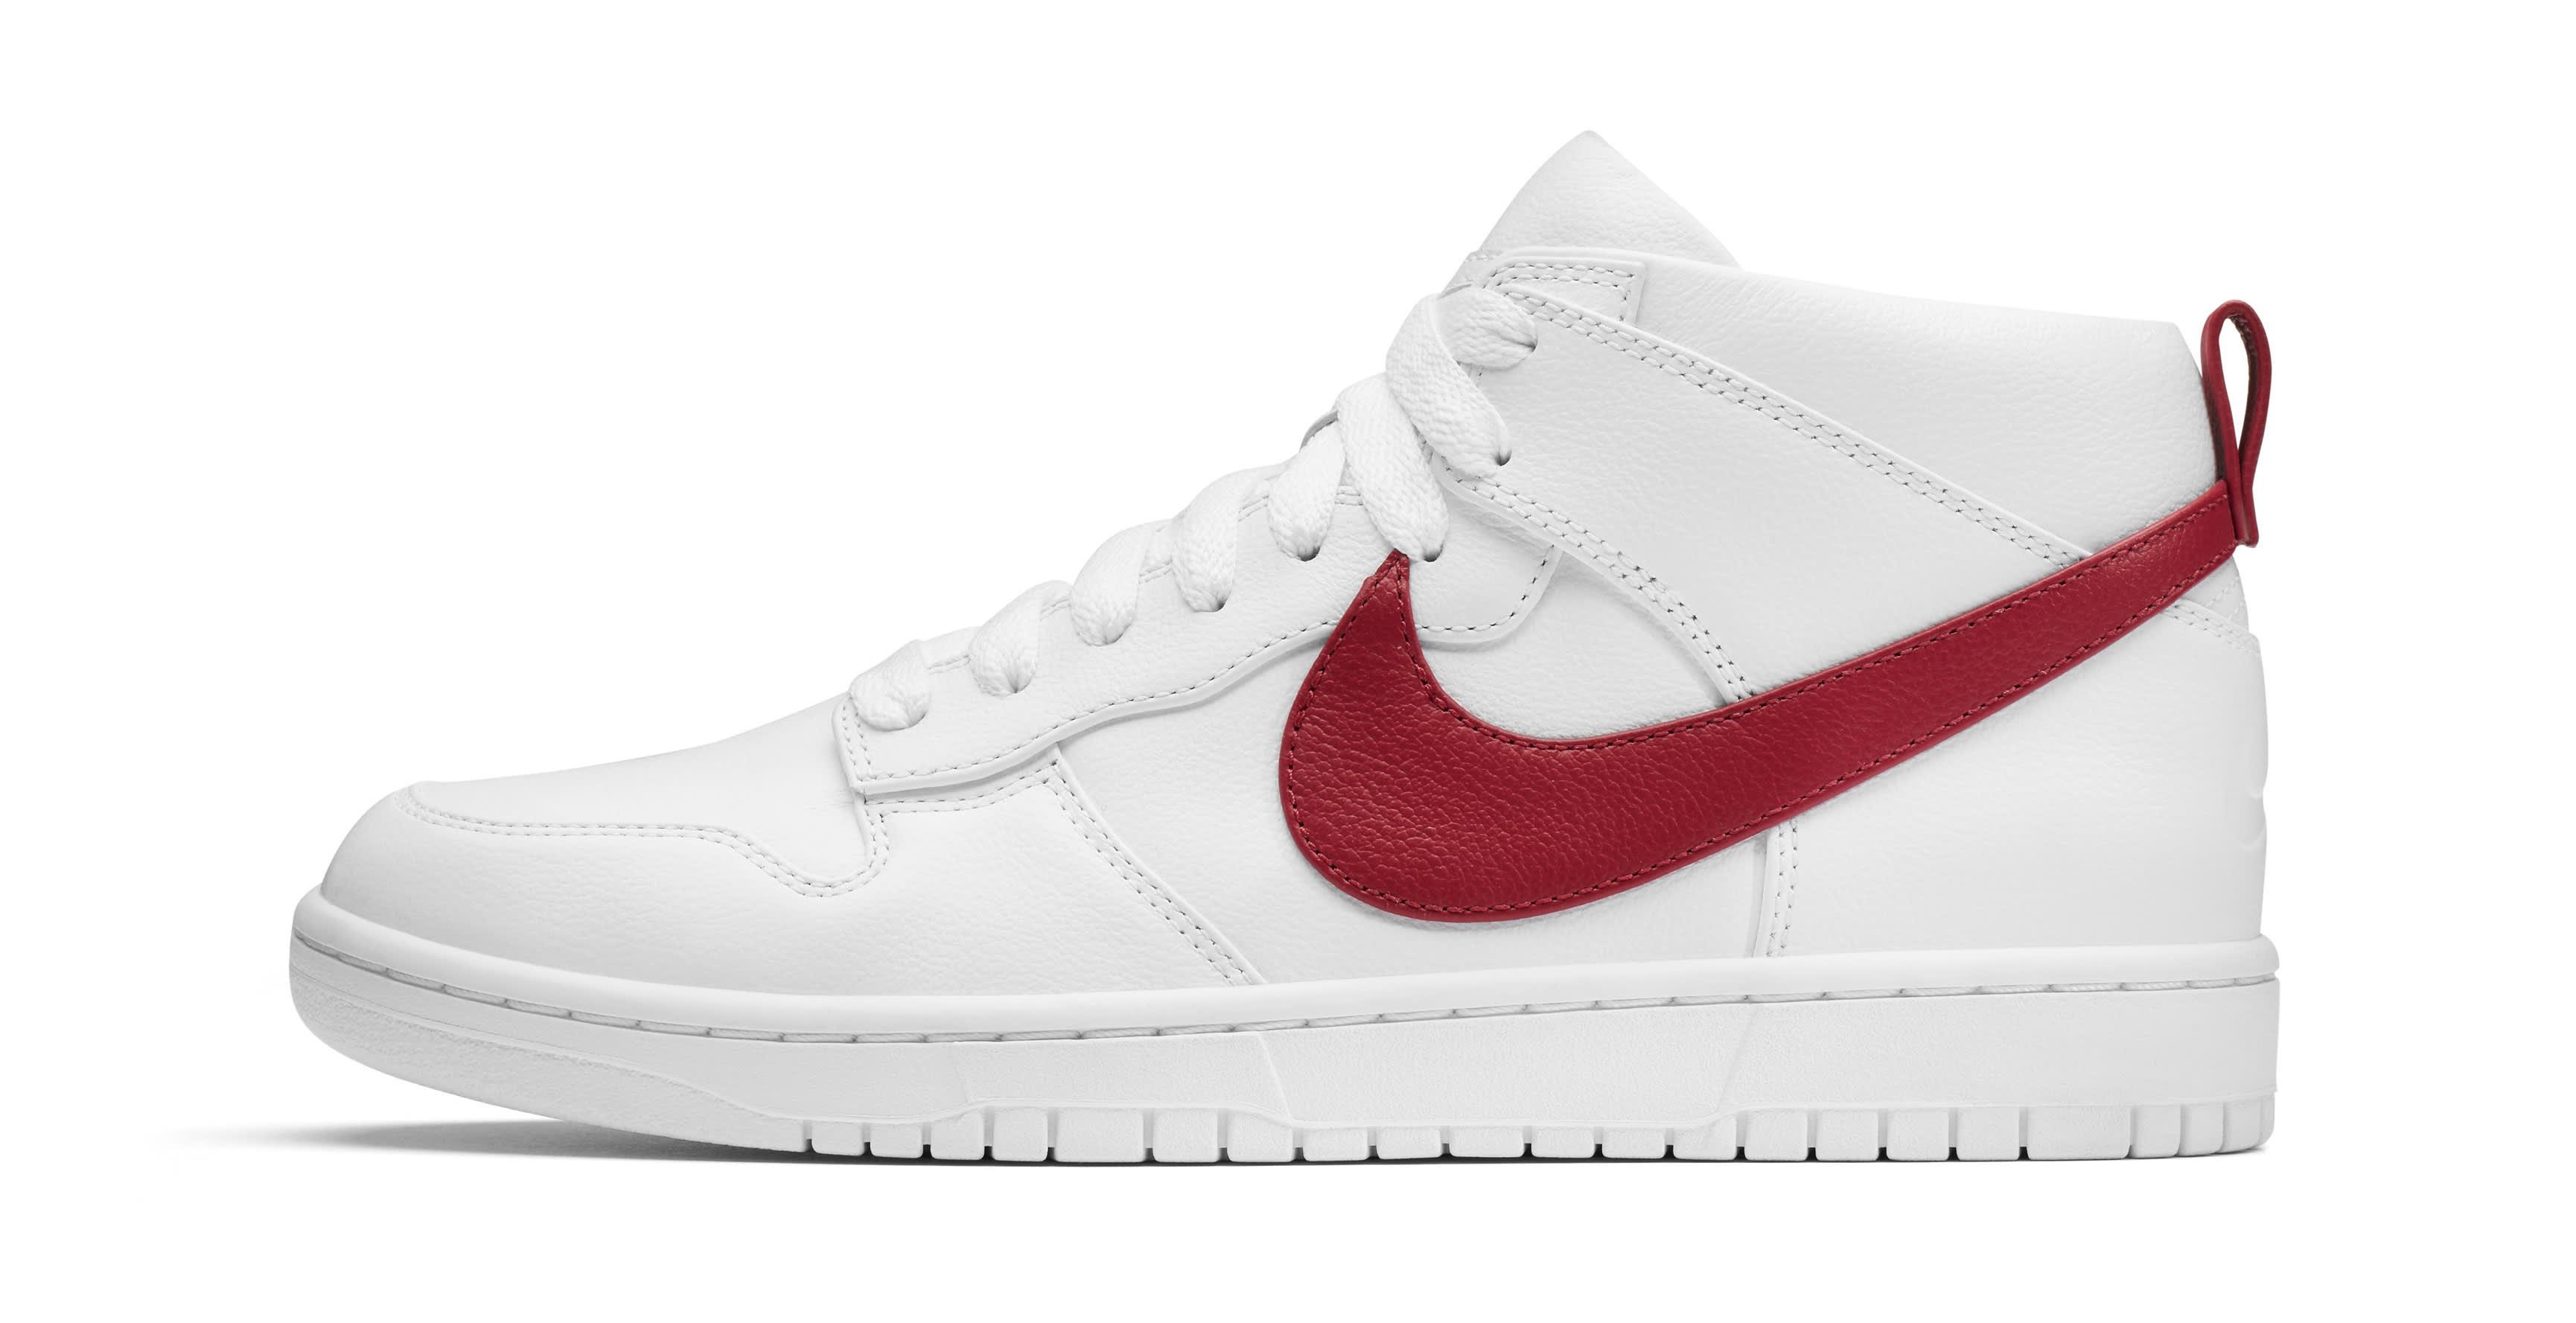 5ce46575c3f5 Image via Nike Riccardo Tisci Nike Dunk Chukka White Red Profile